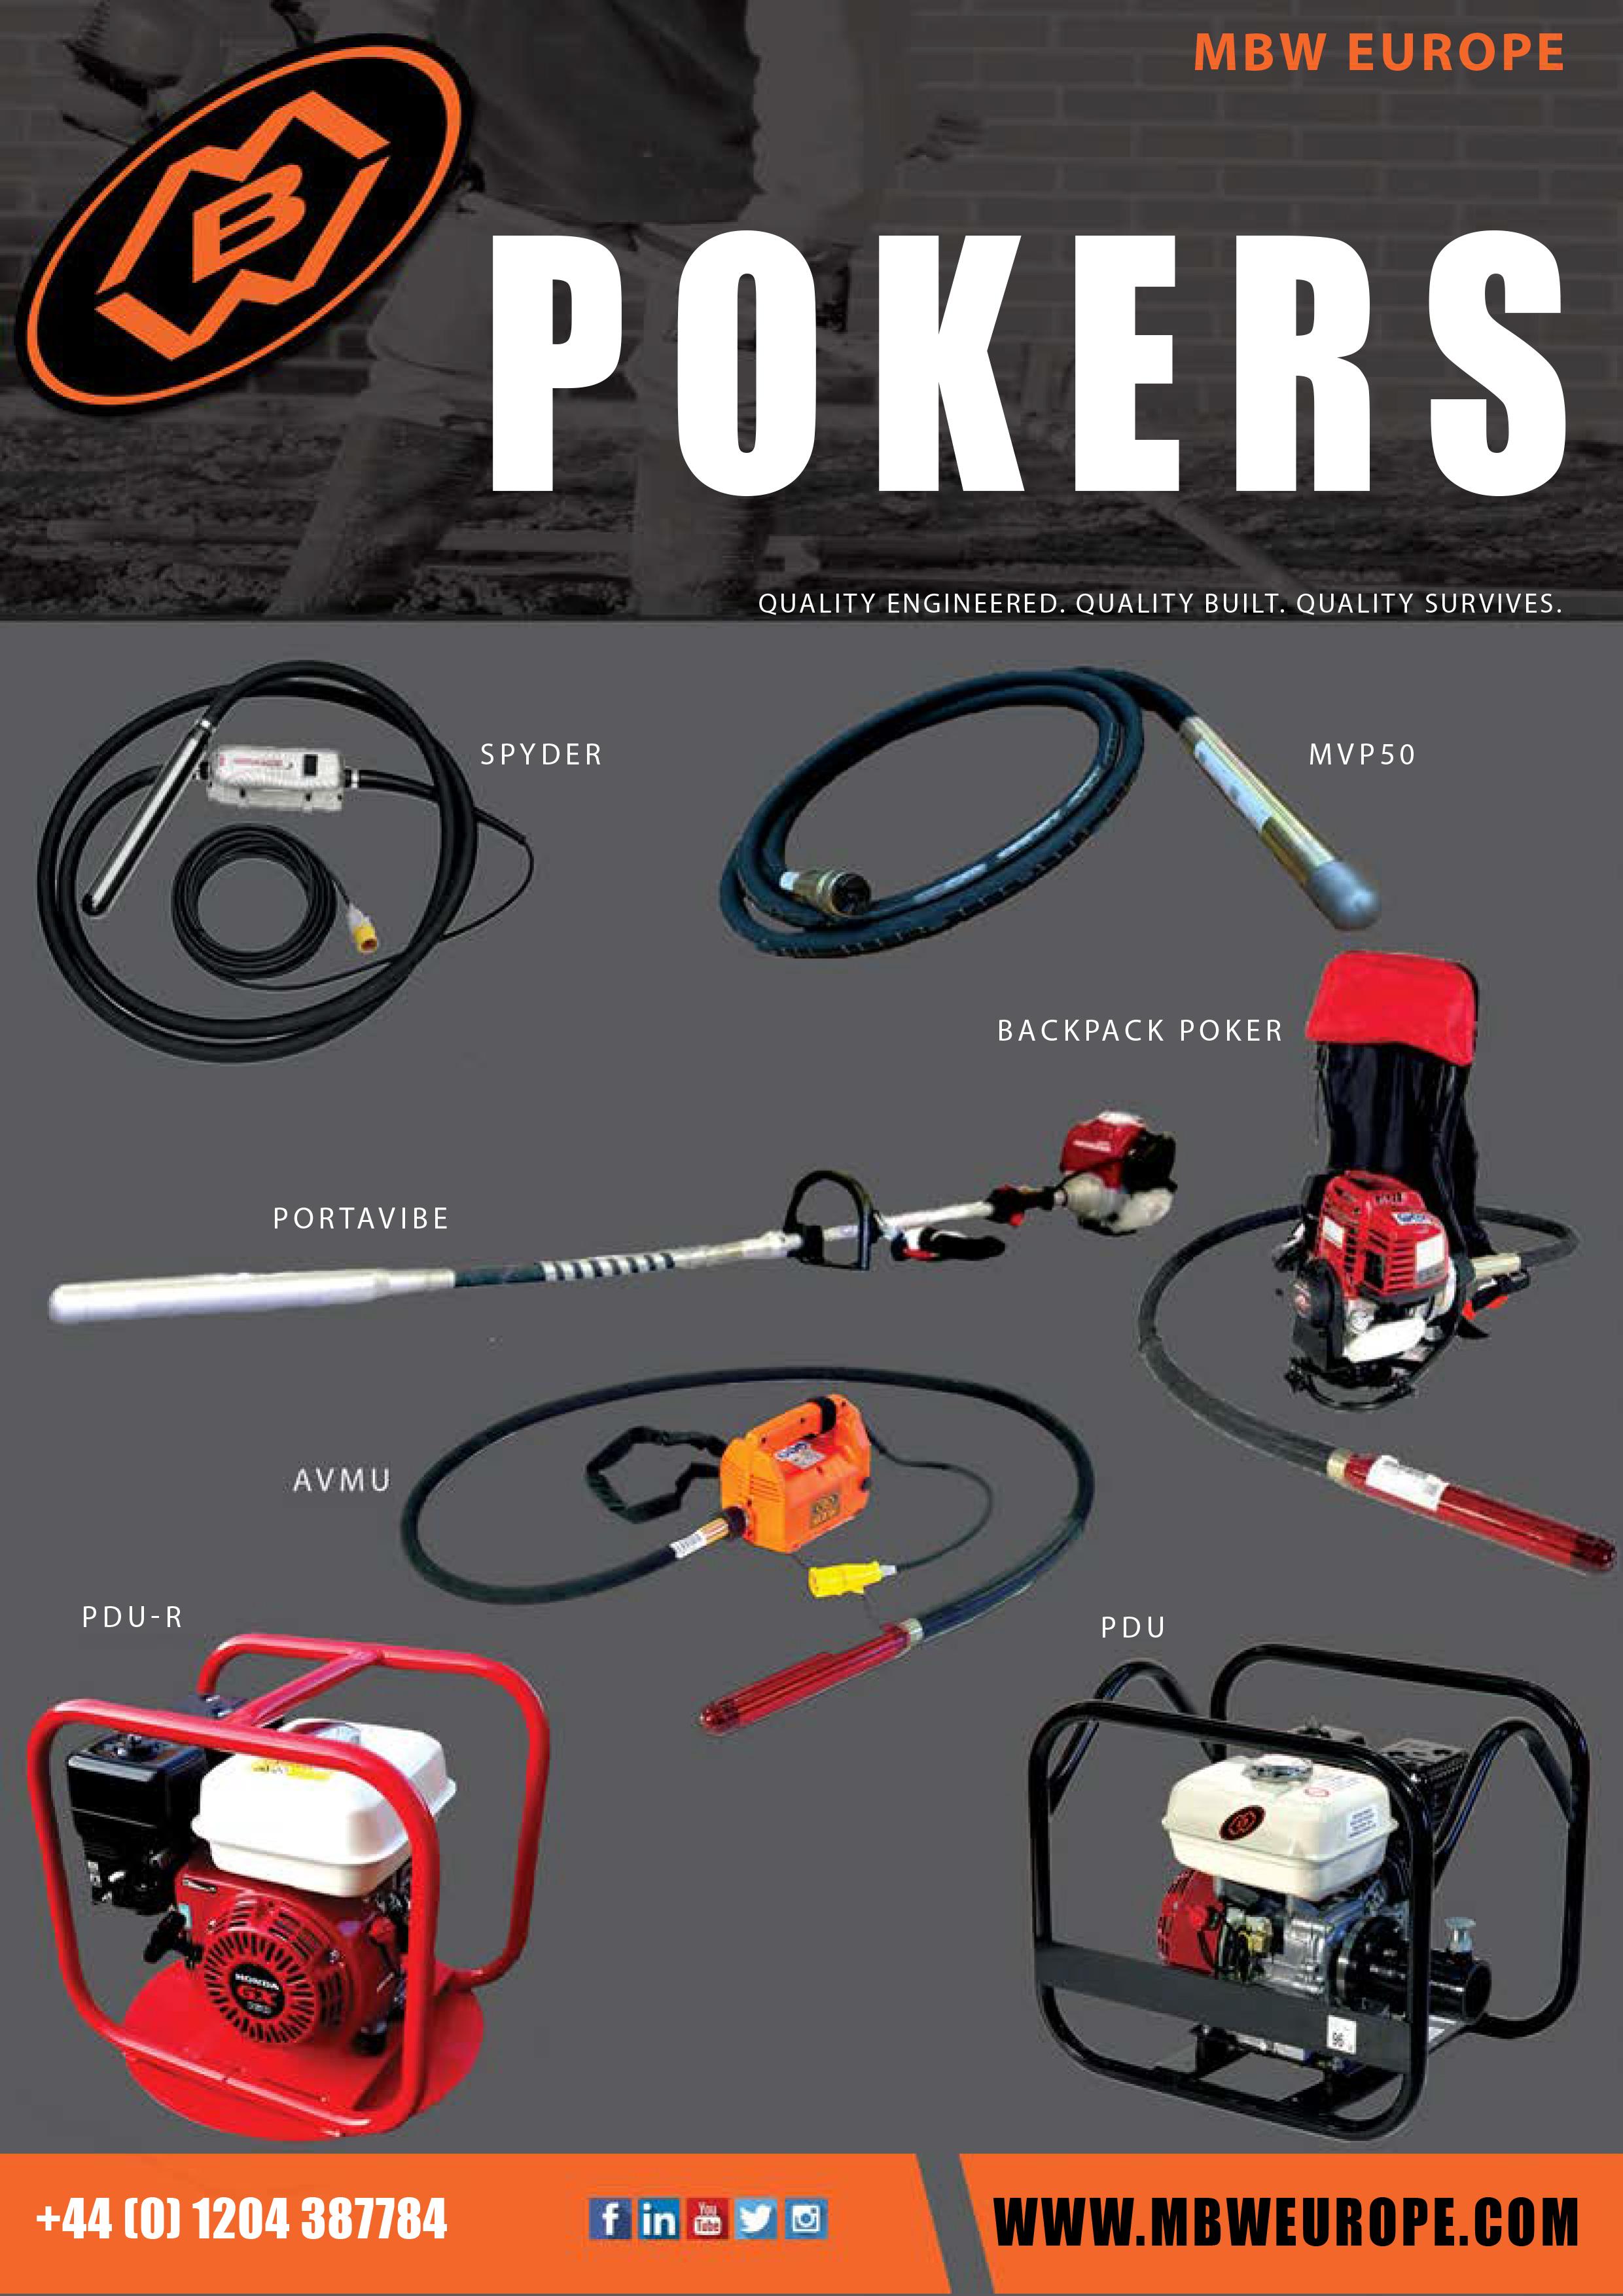 Spyder High Frequency Poker